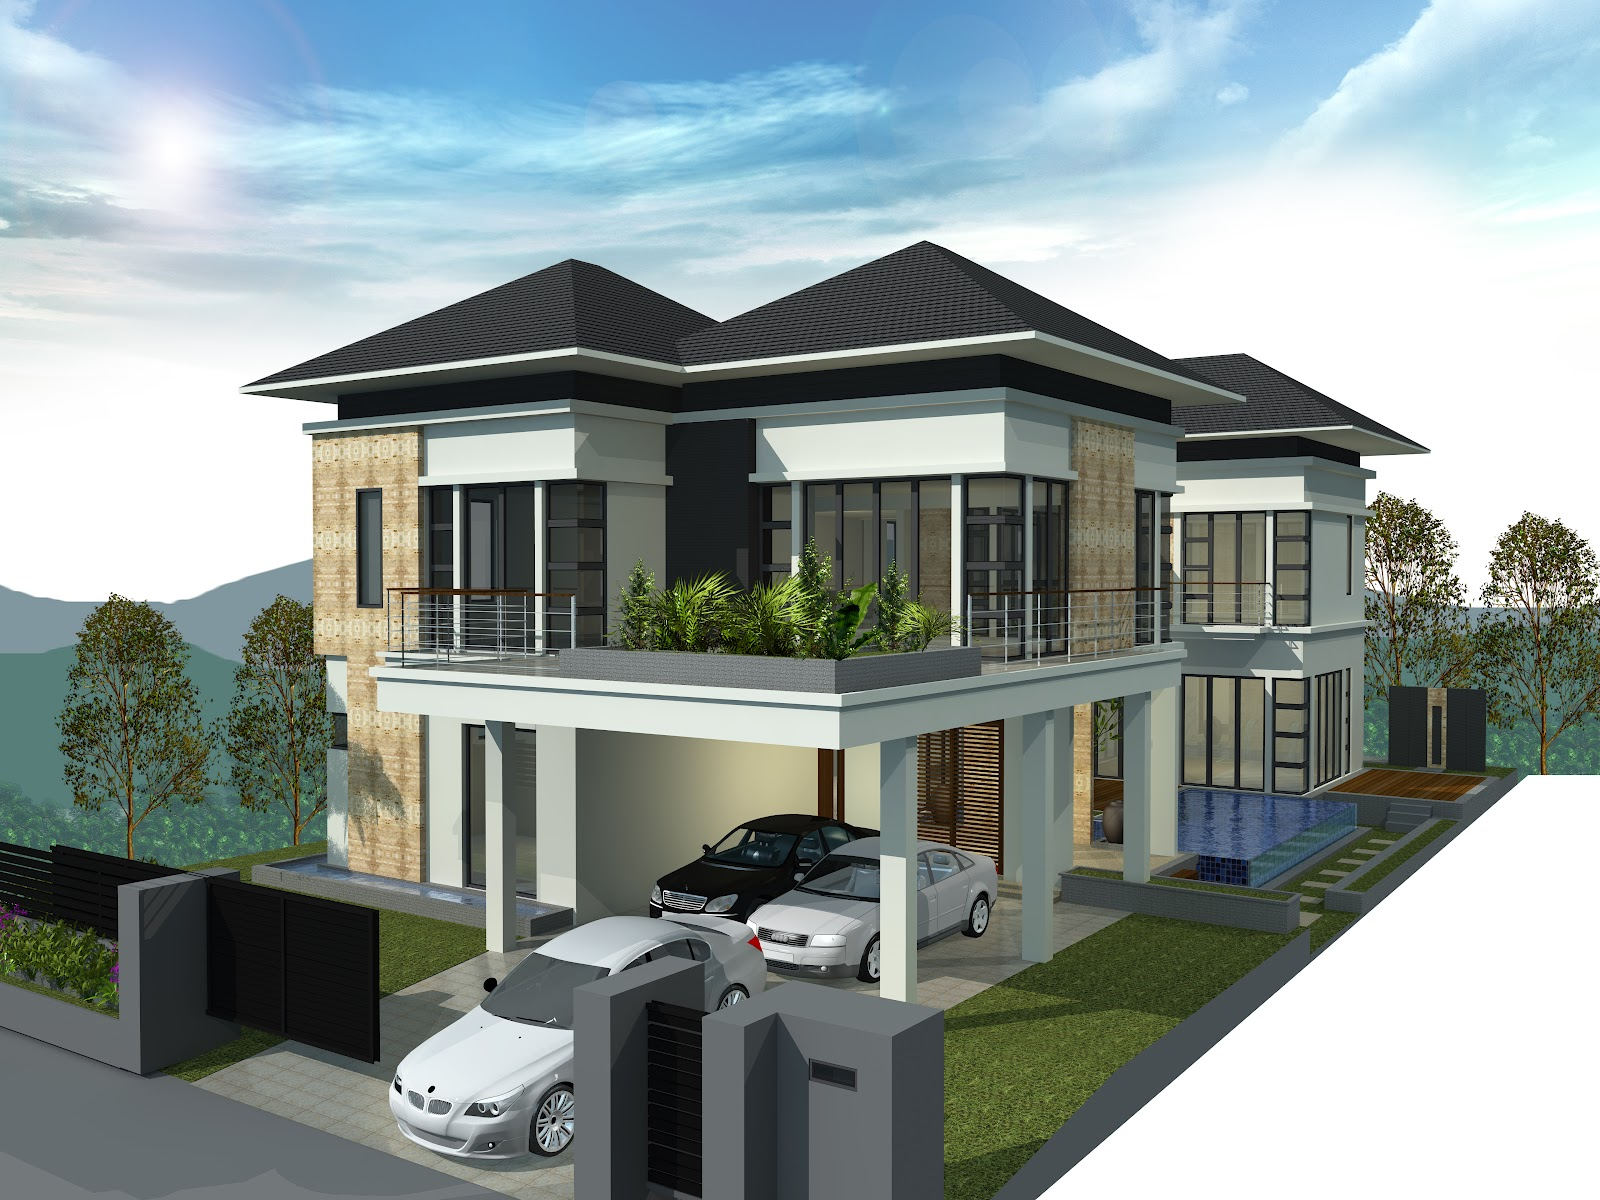 Malaysia Dream House: Villa Bungalow in USJ, Selangor Malaysia